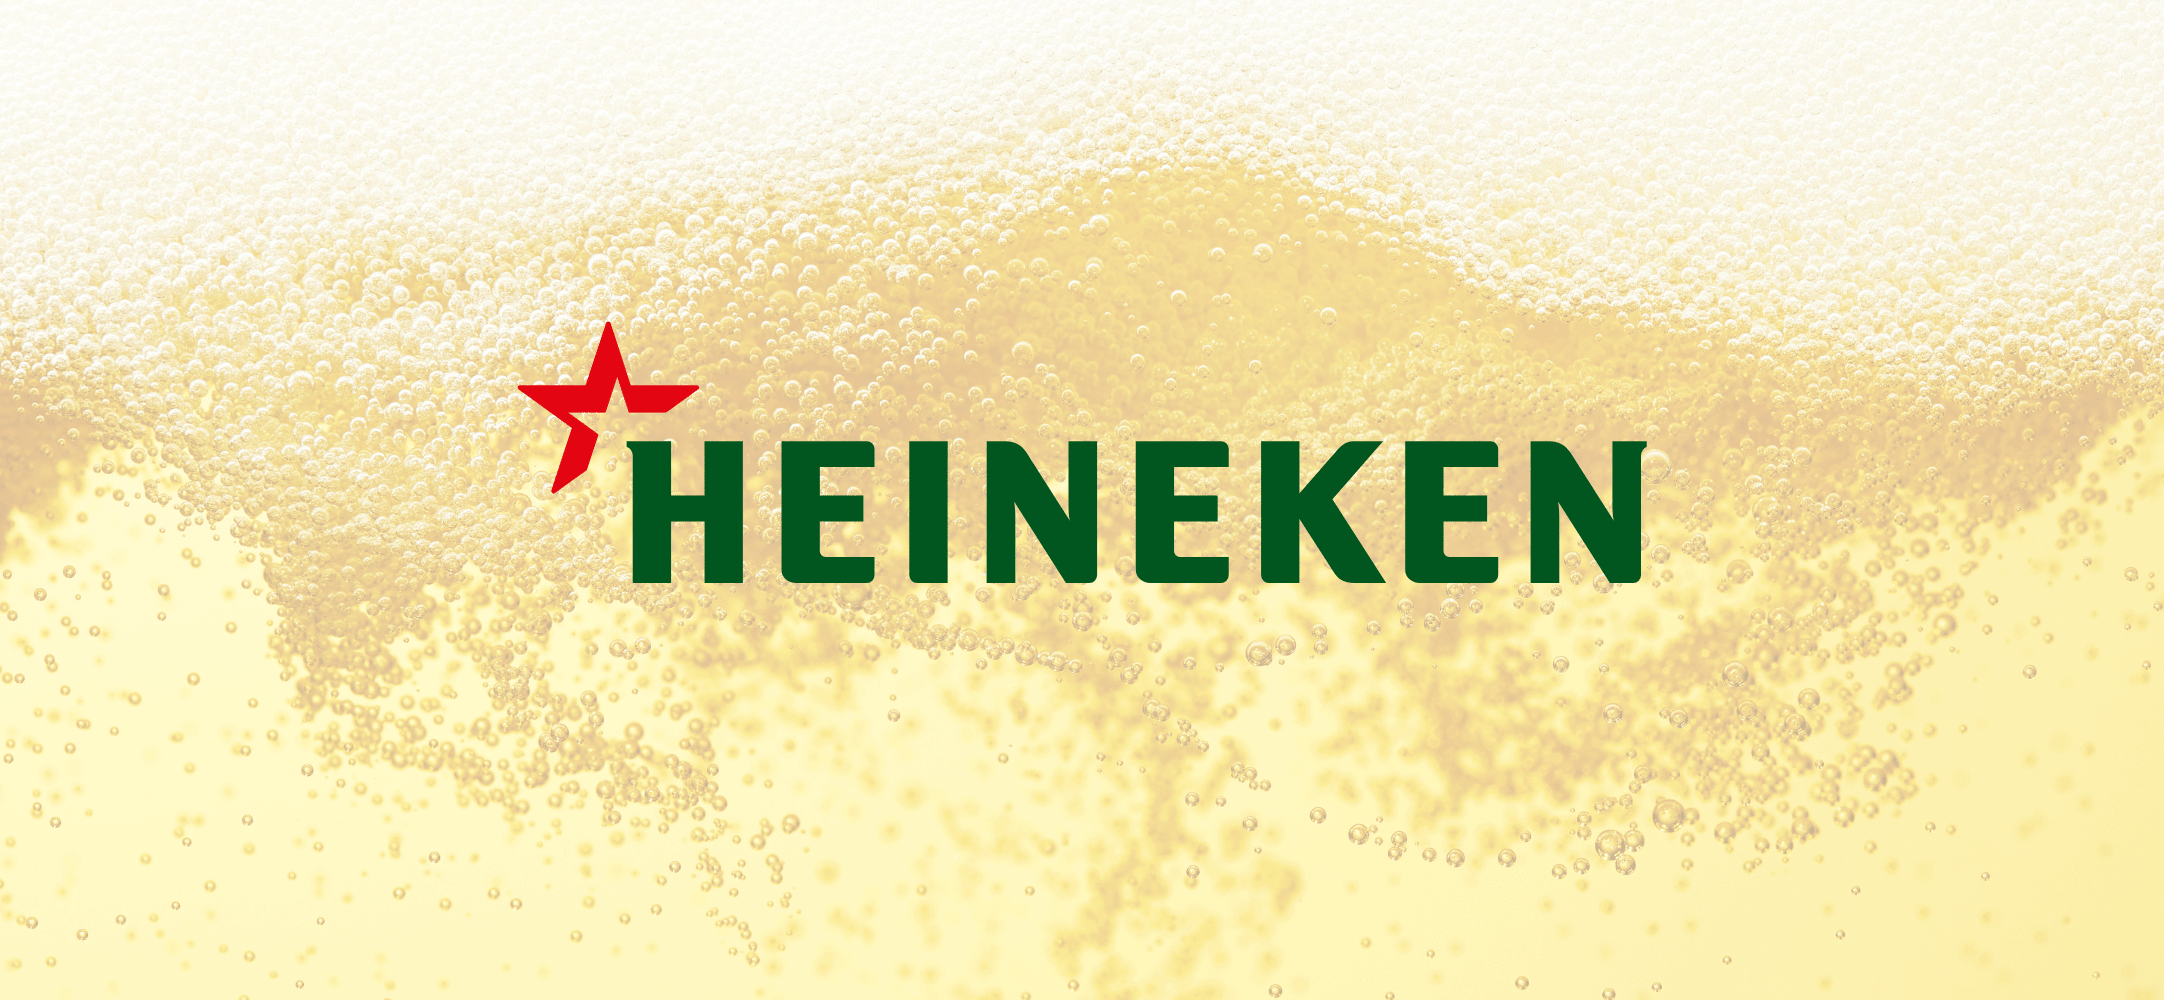 Beer background and Heineken logo